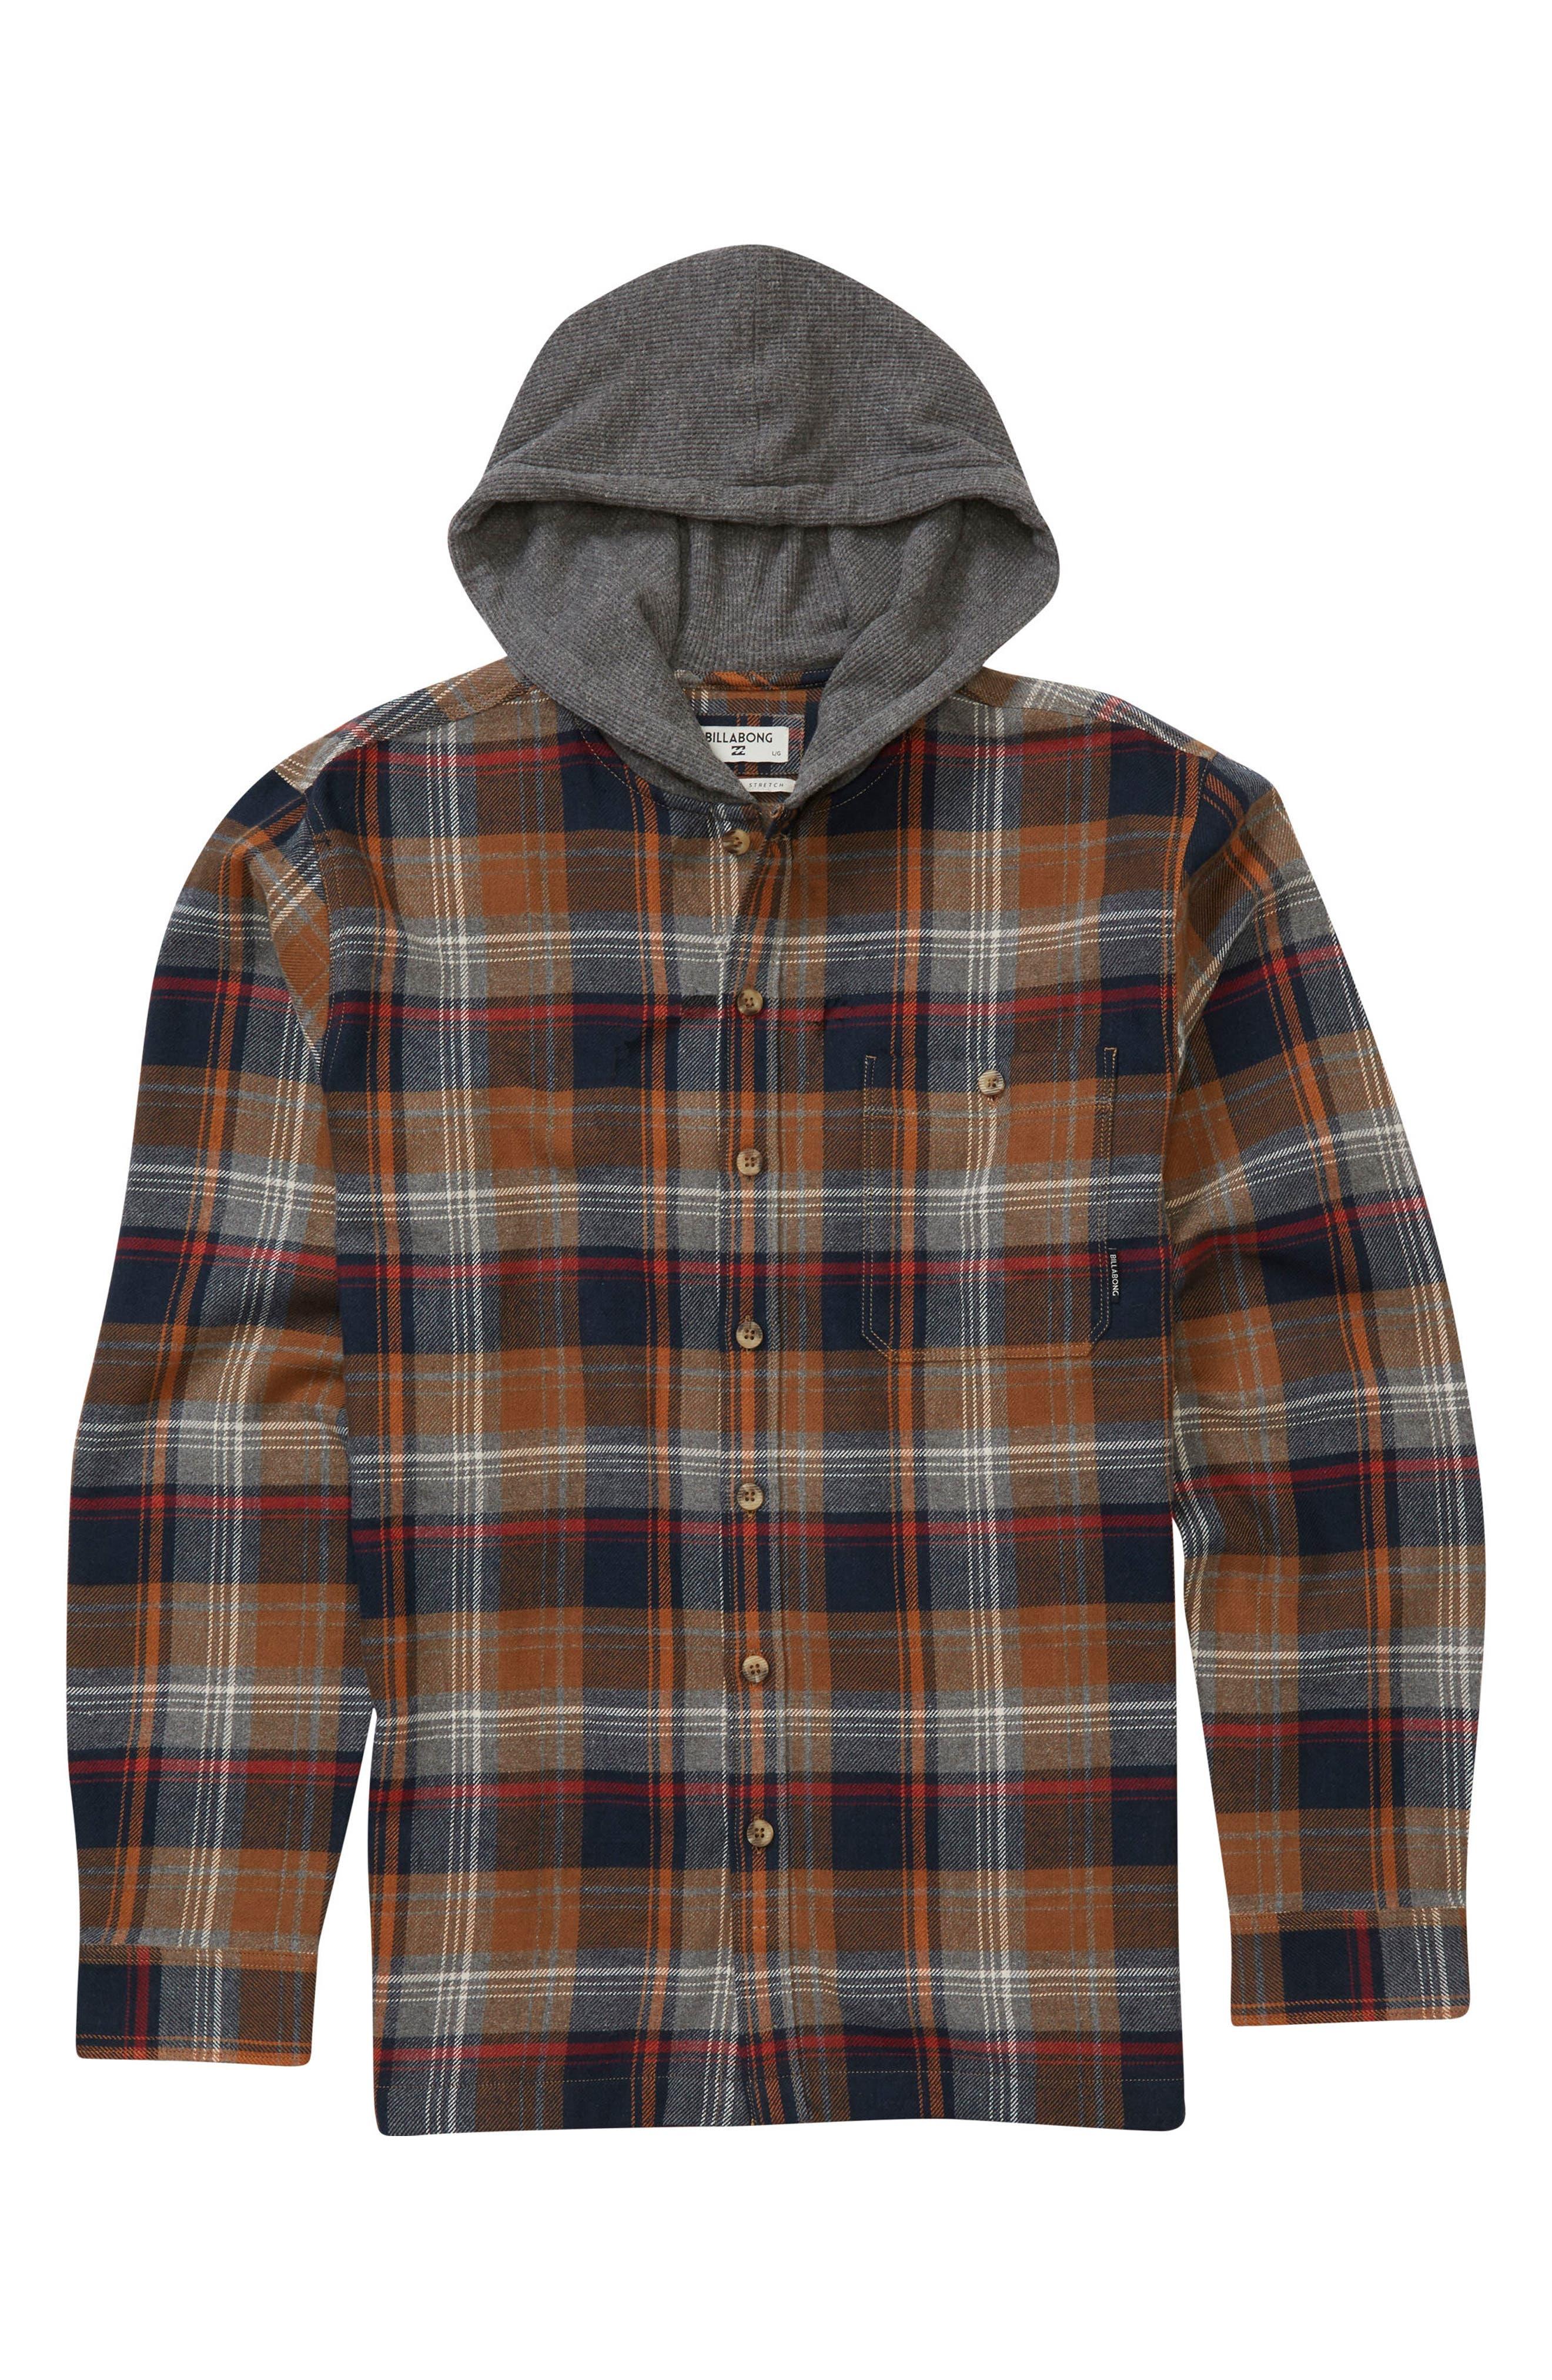 Baja Hooded Flannel,                             Main thumbnail 1, color,                             Tobacco